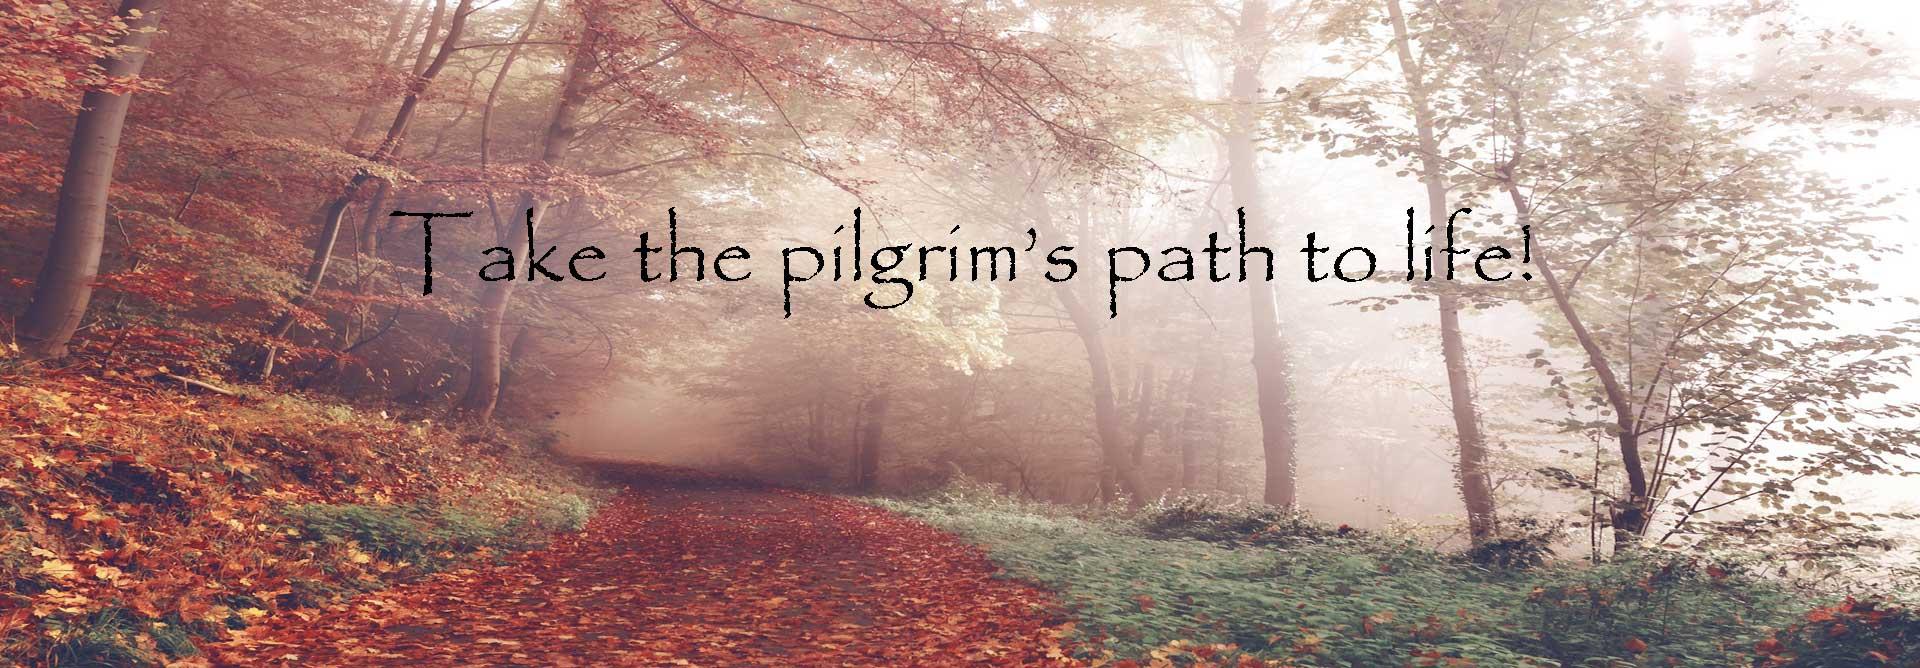 Take the Pilgrim's Path to Life